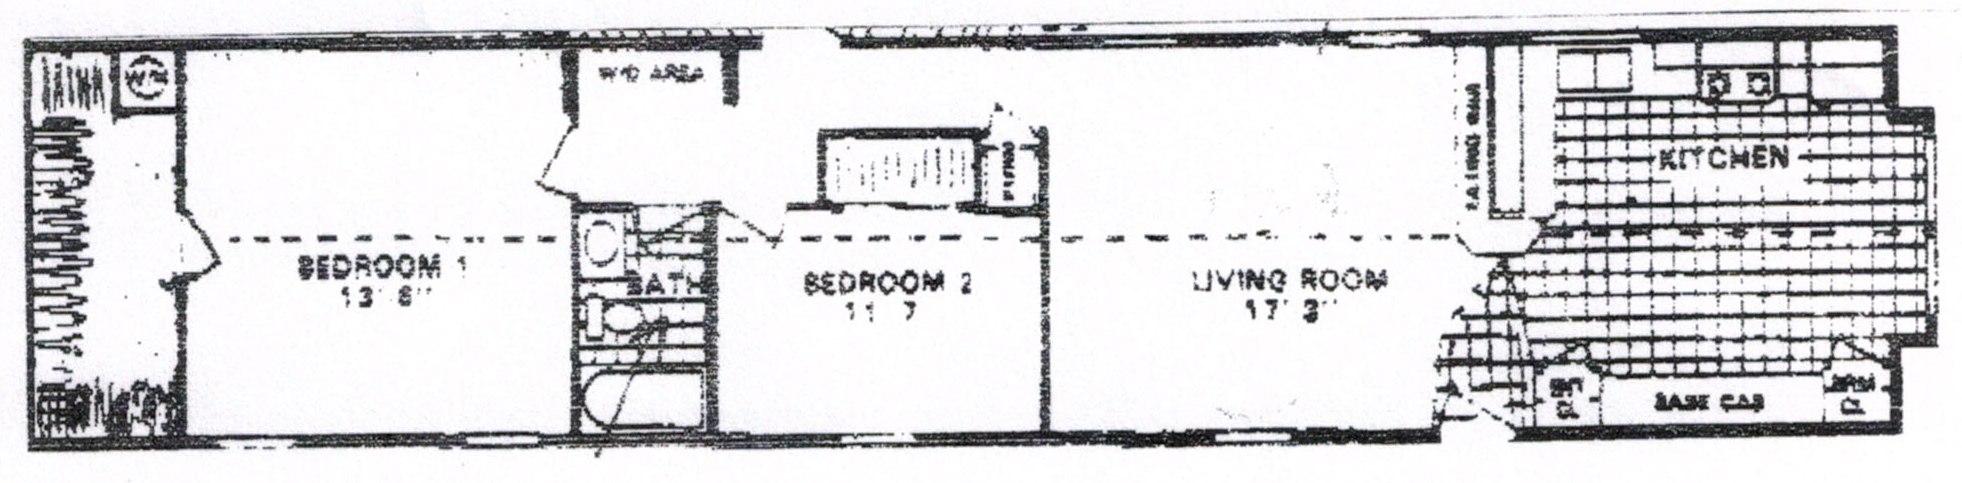 18 Mobile Floor Plan